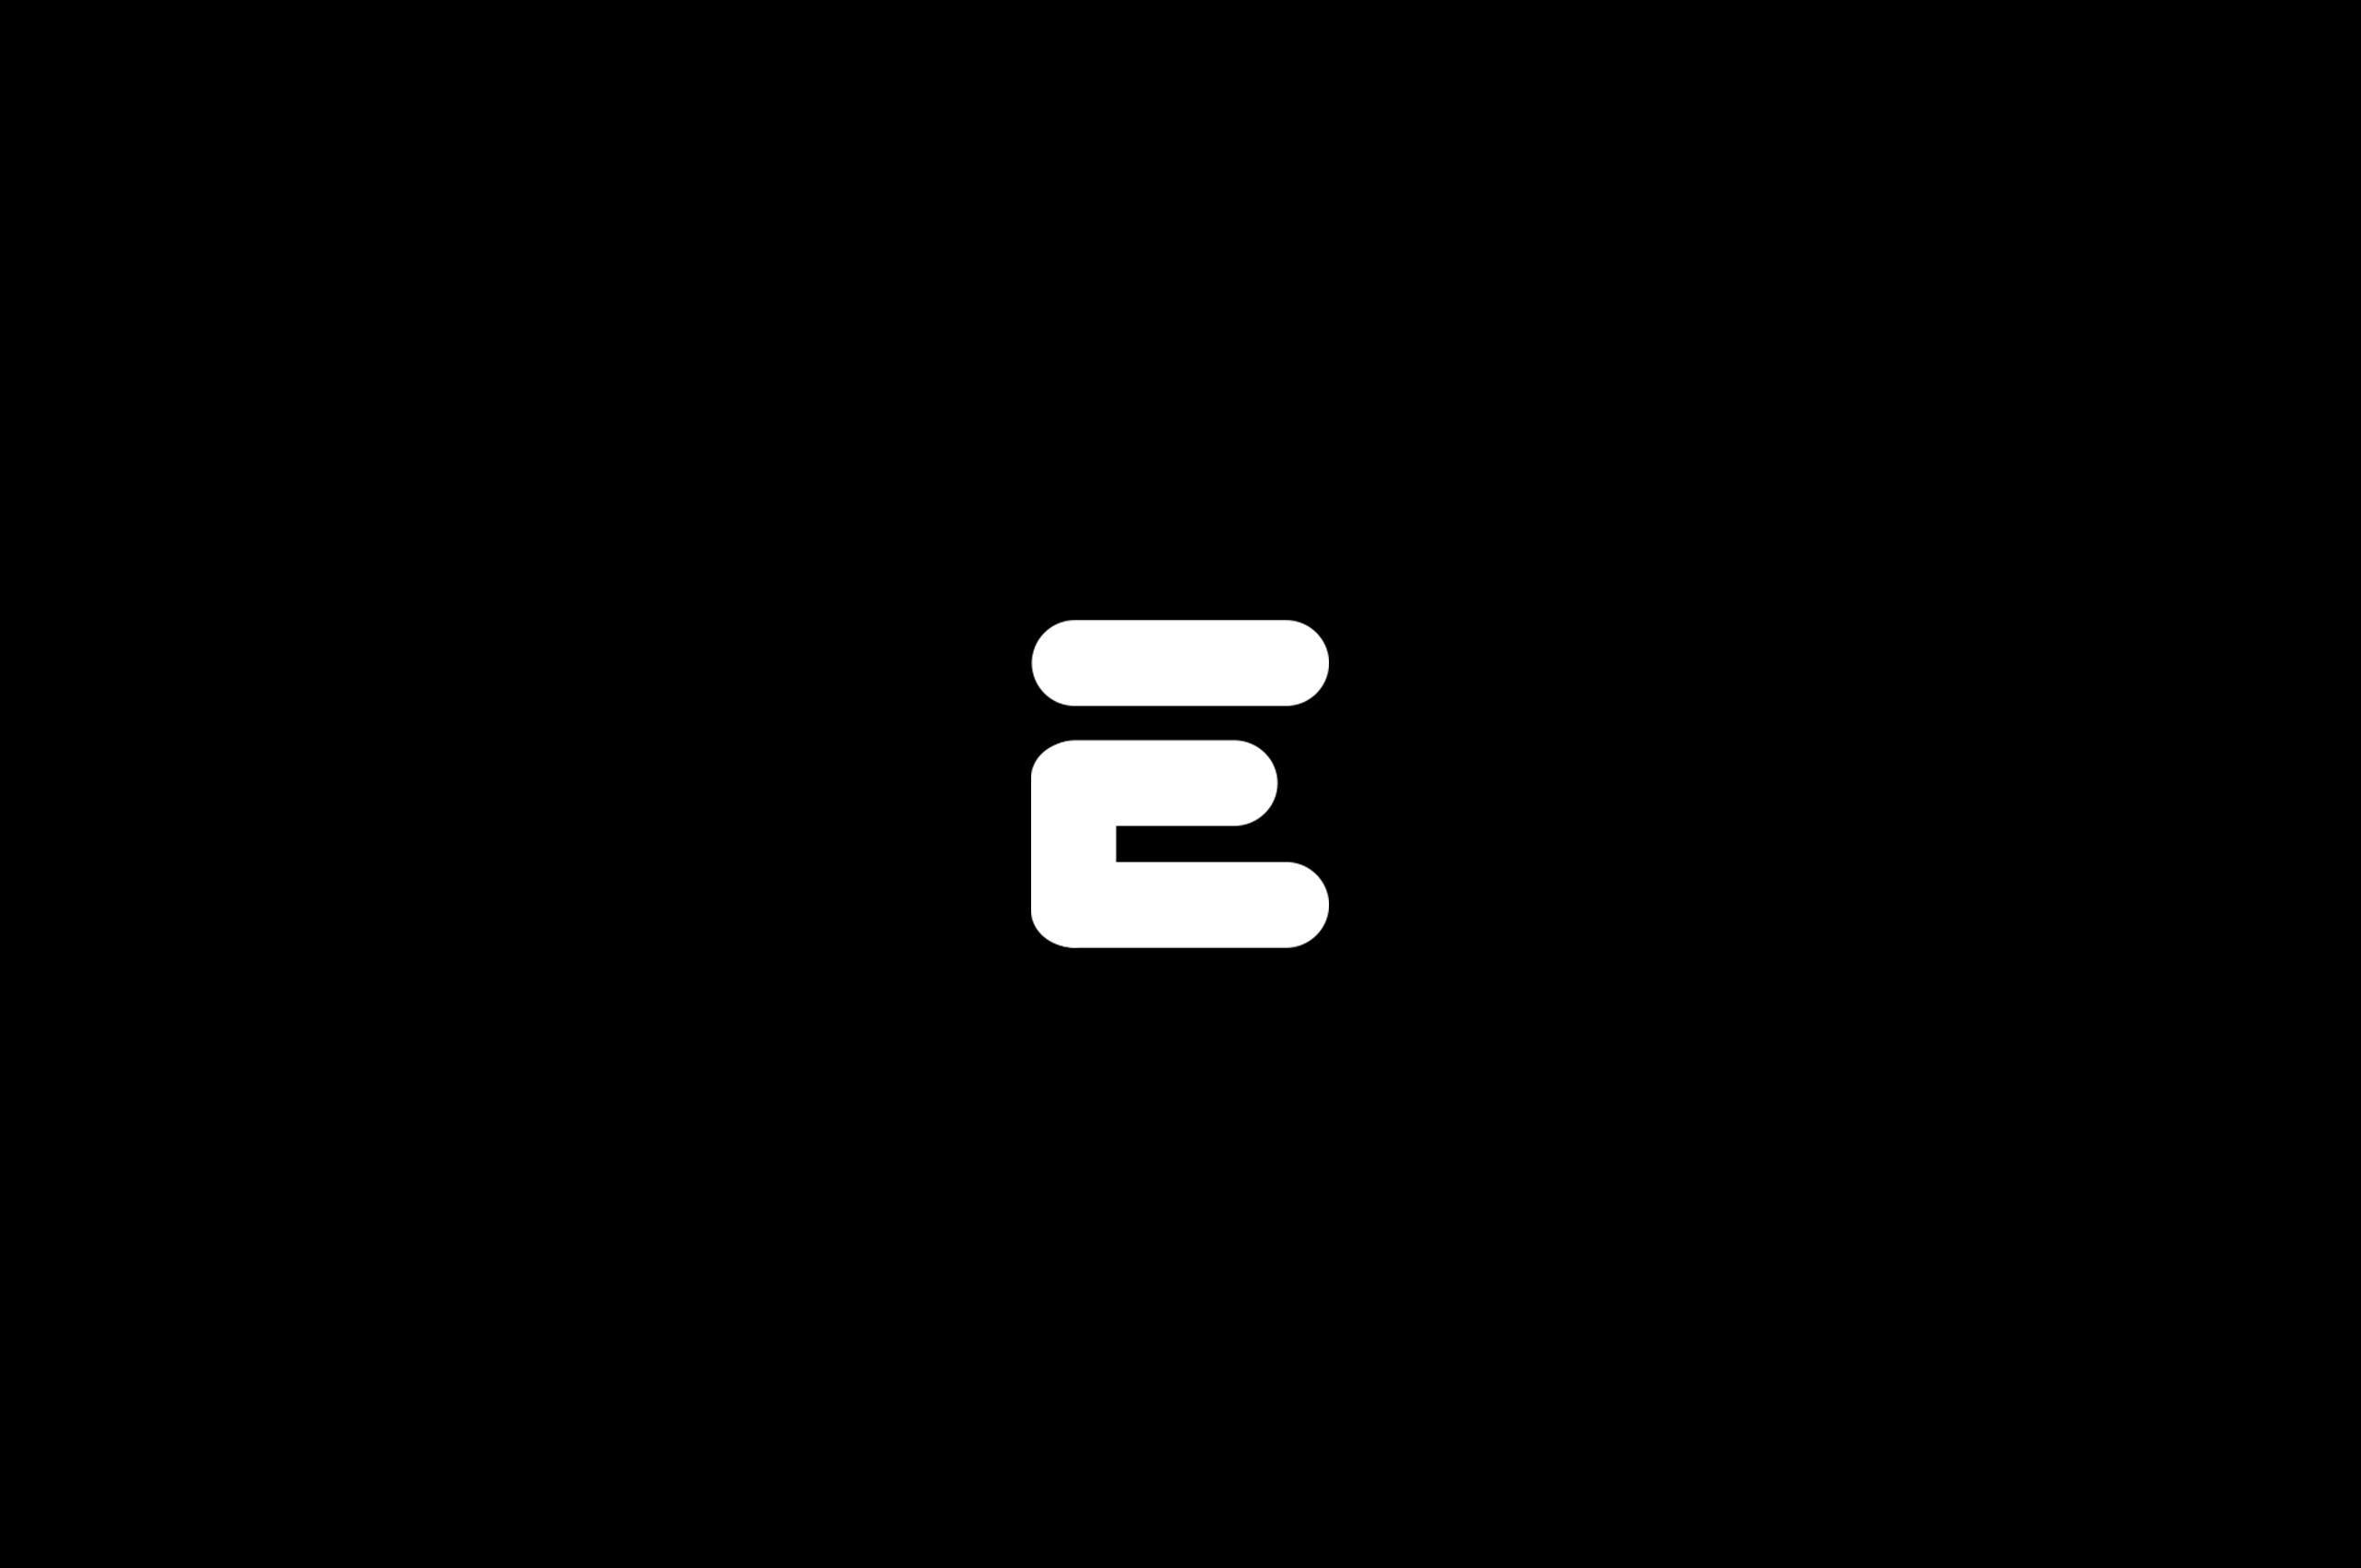 logo-10-black